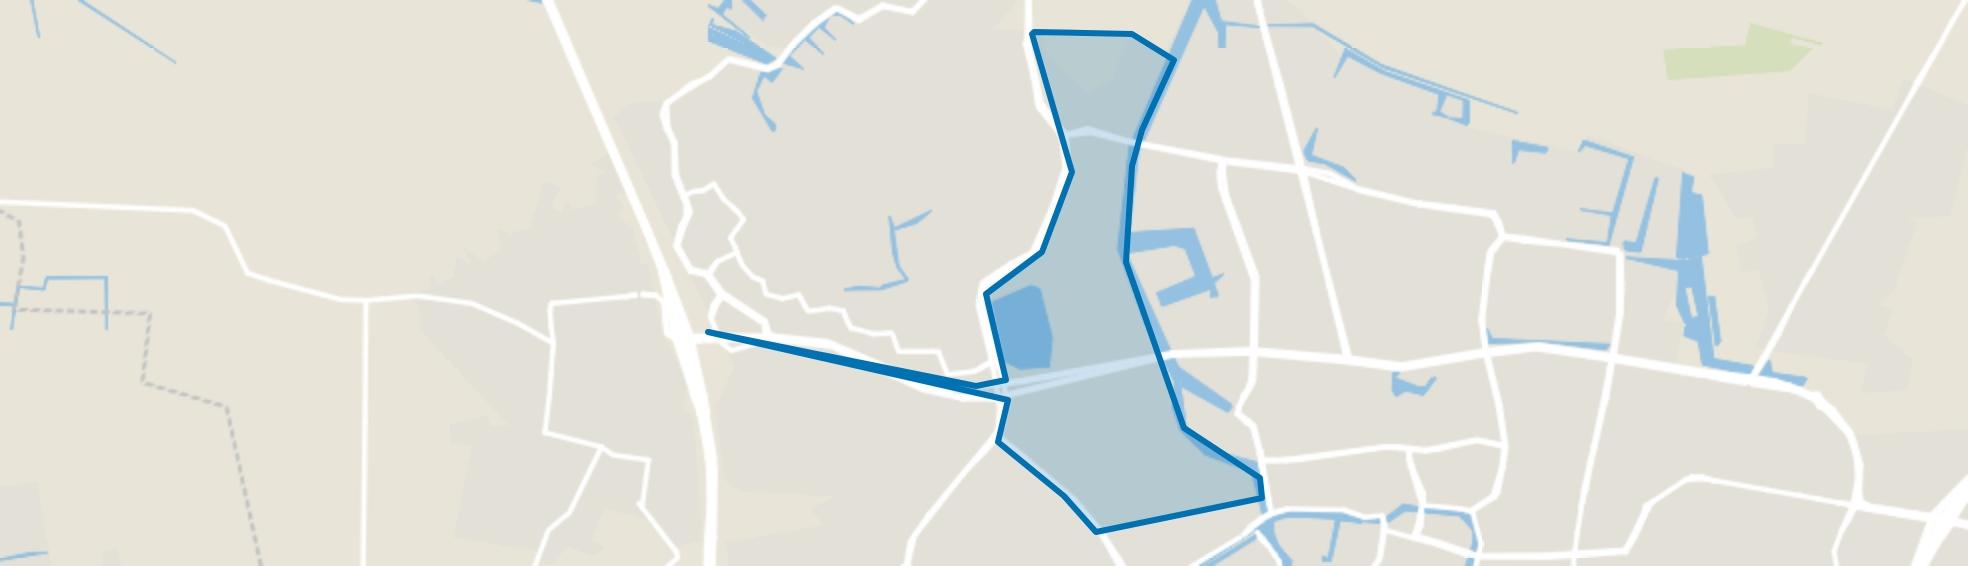 Emer, Breda map